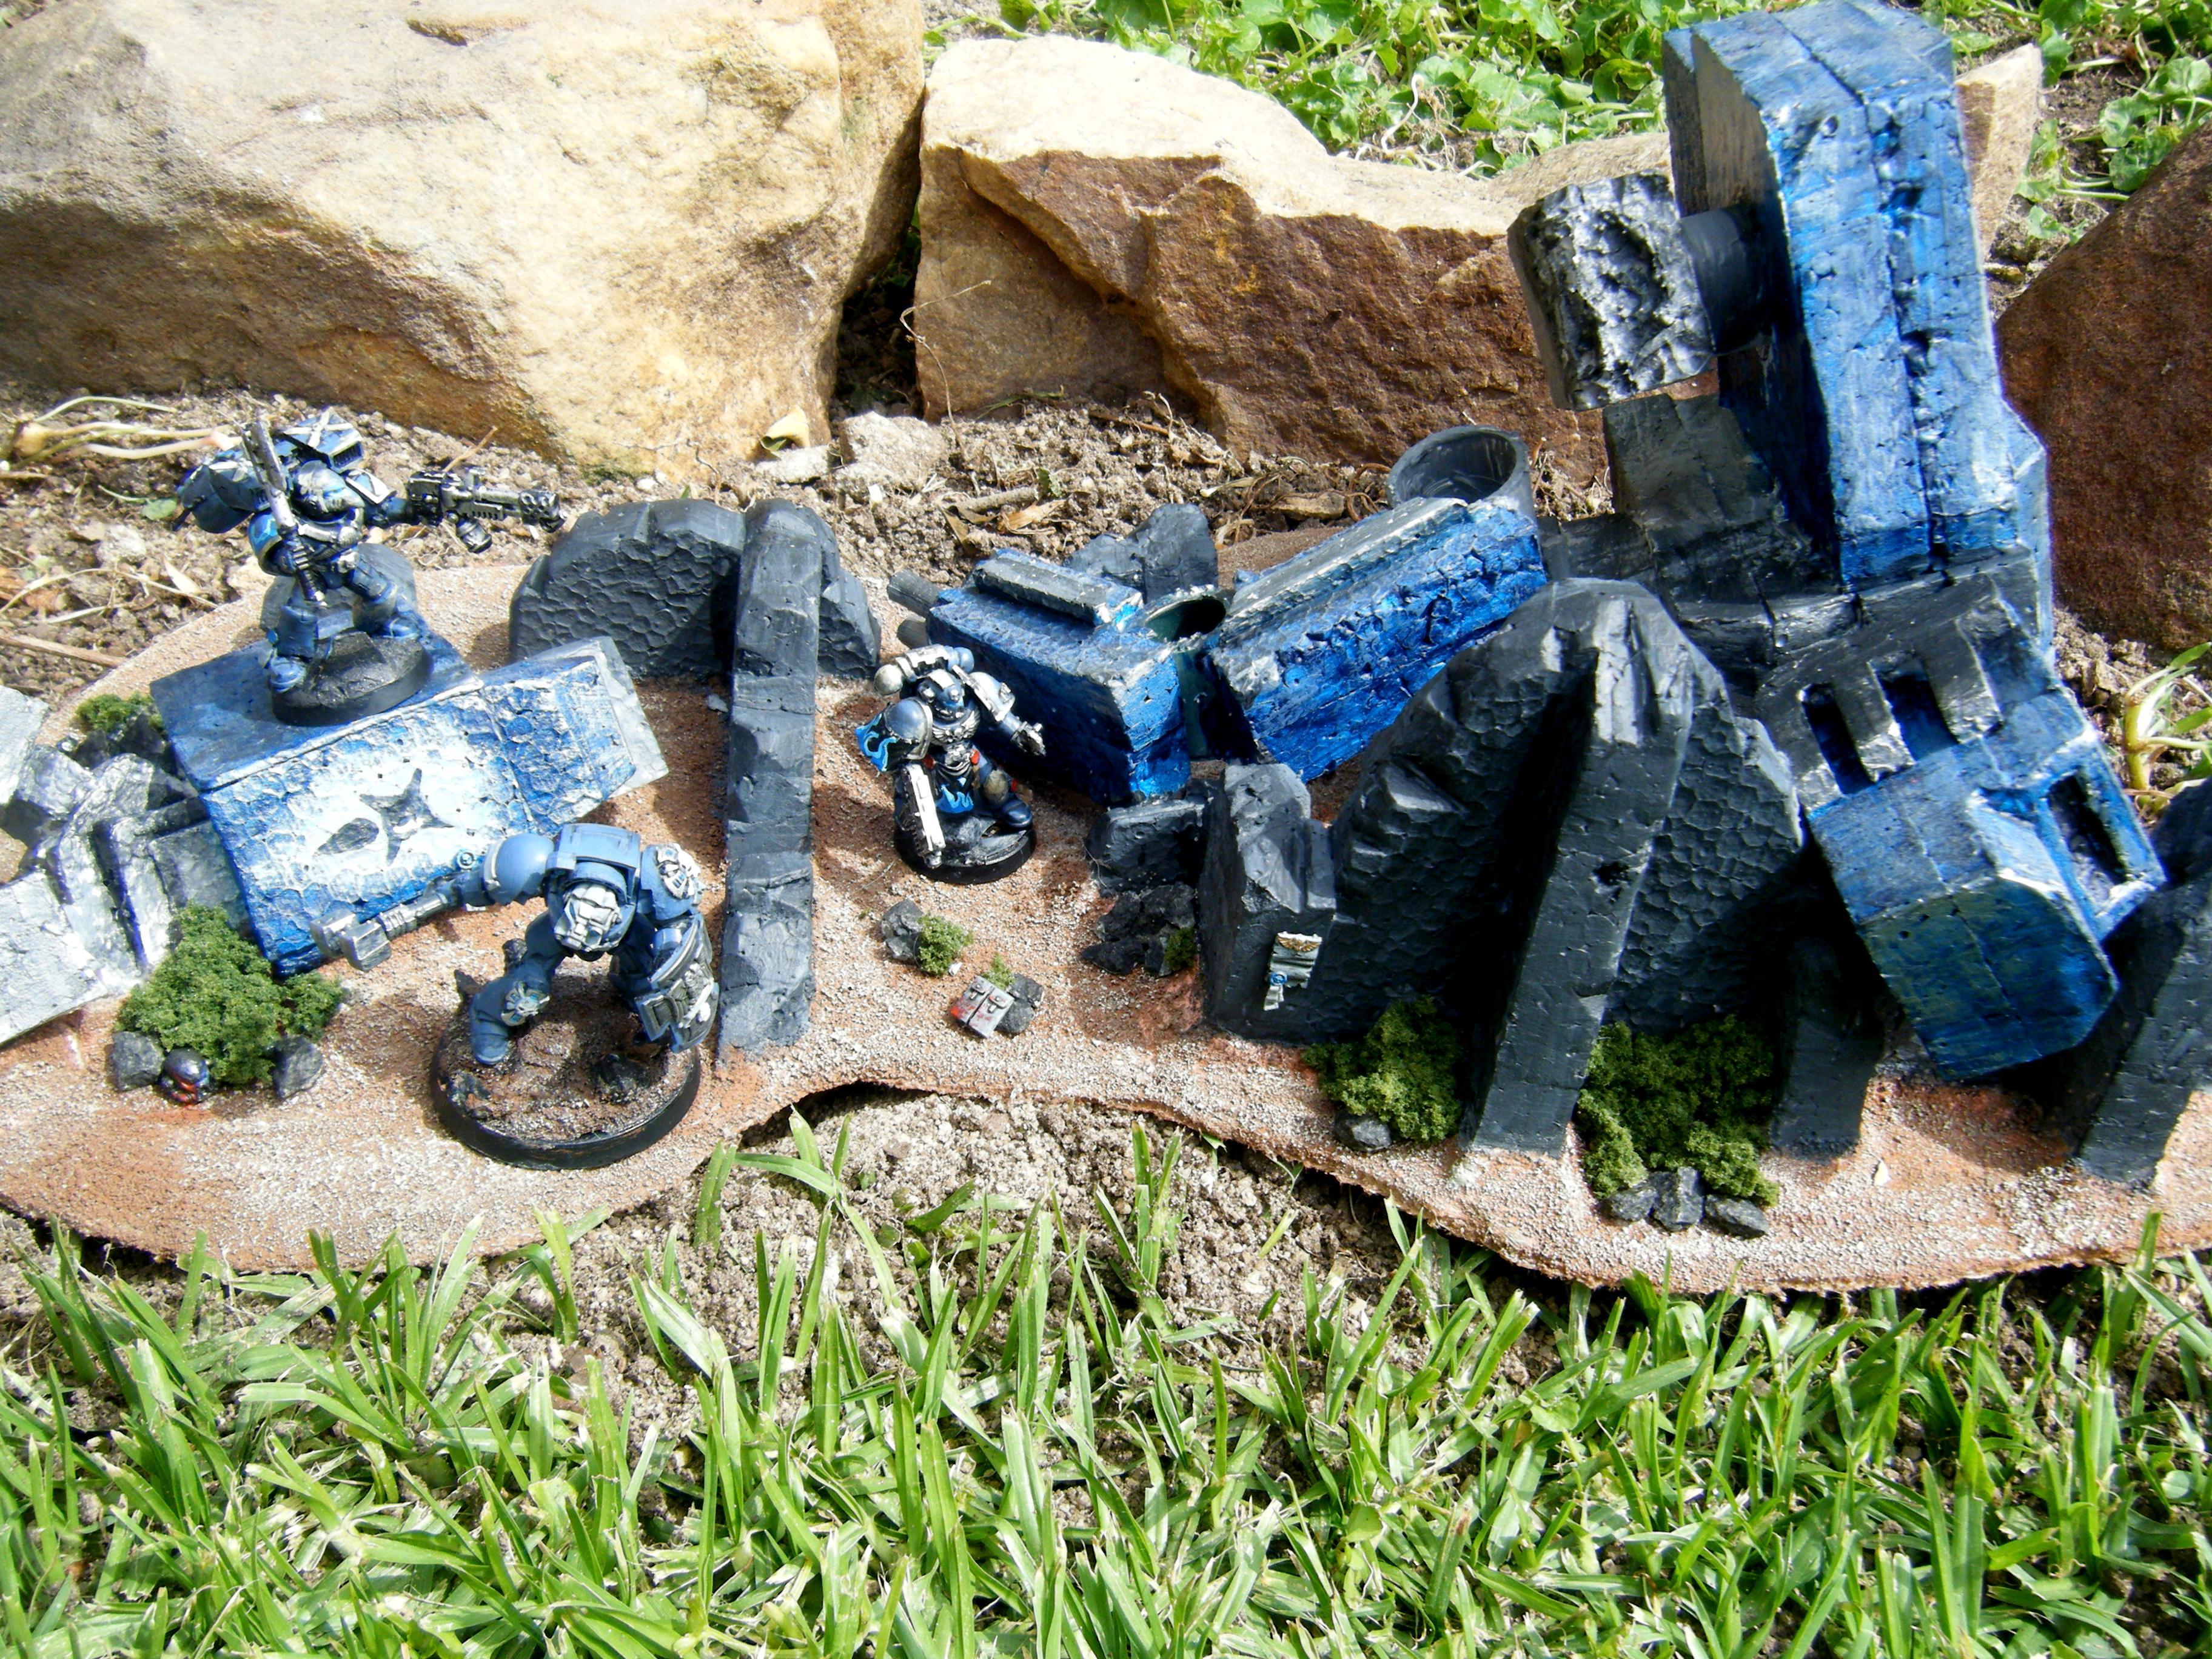 Base, Blue, Destroyed, Grass, Titan